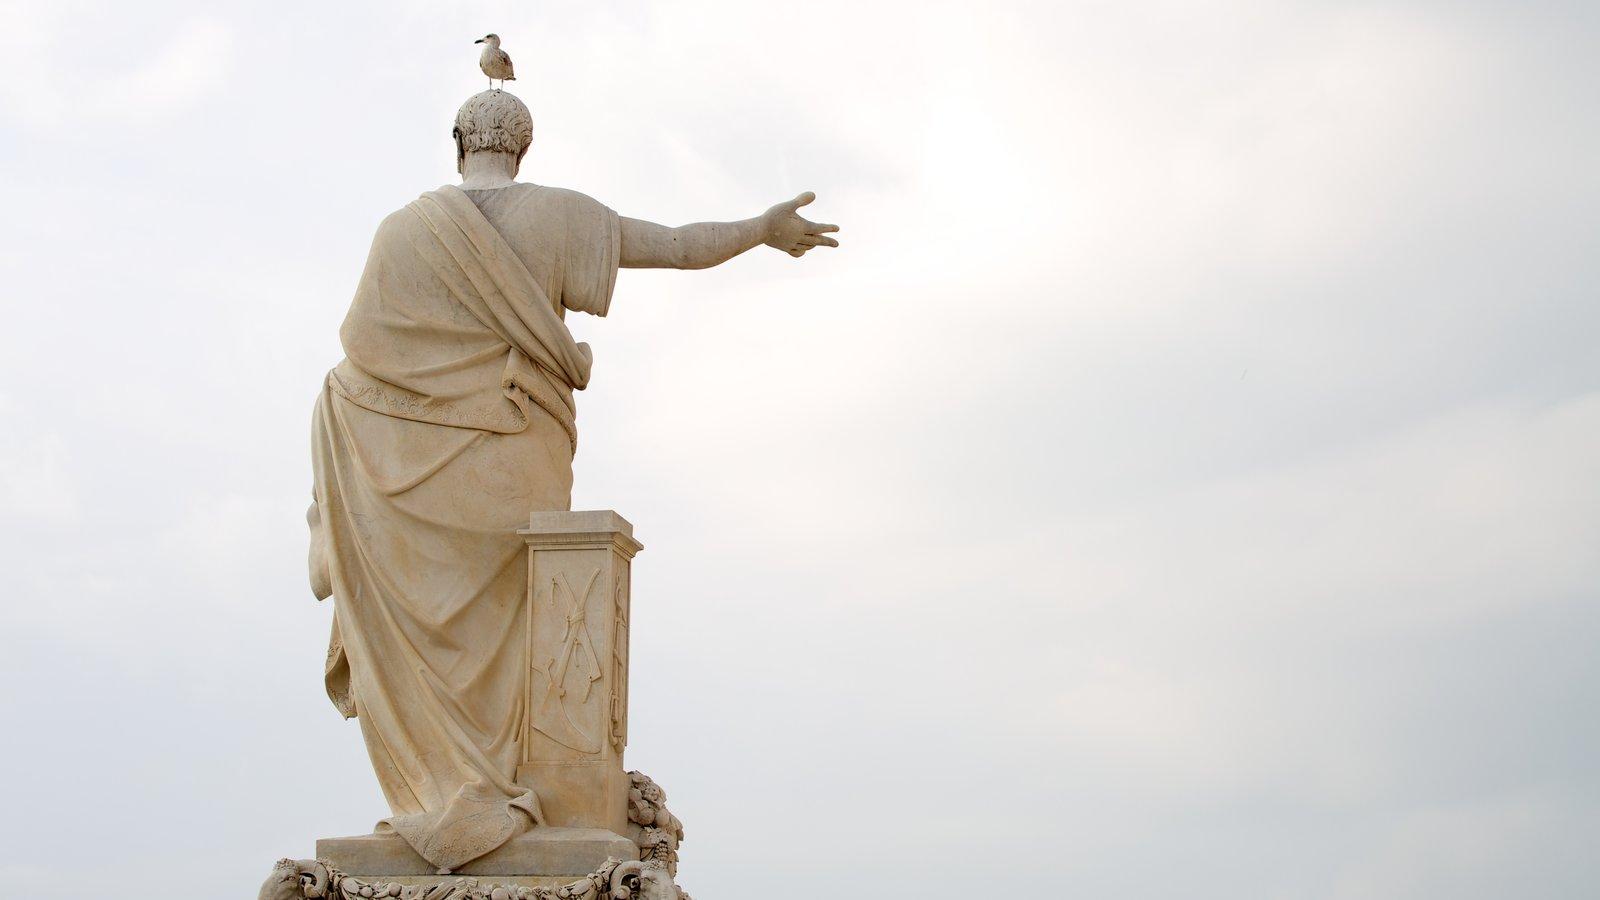 Piazza della Repubblica featuring outdoor art, a statue or sculpture and art